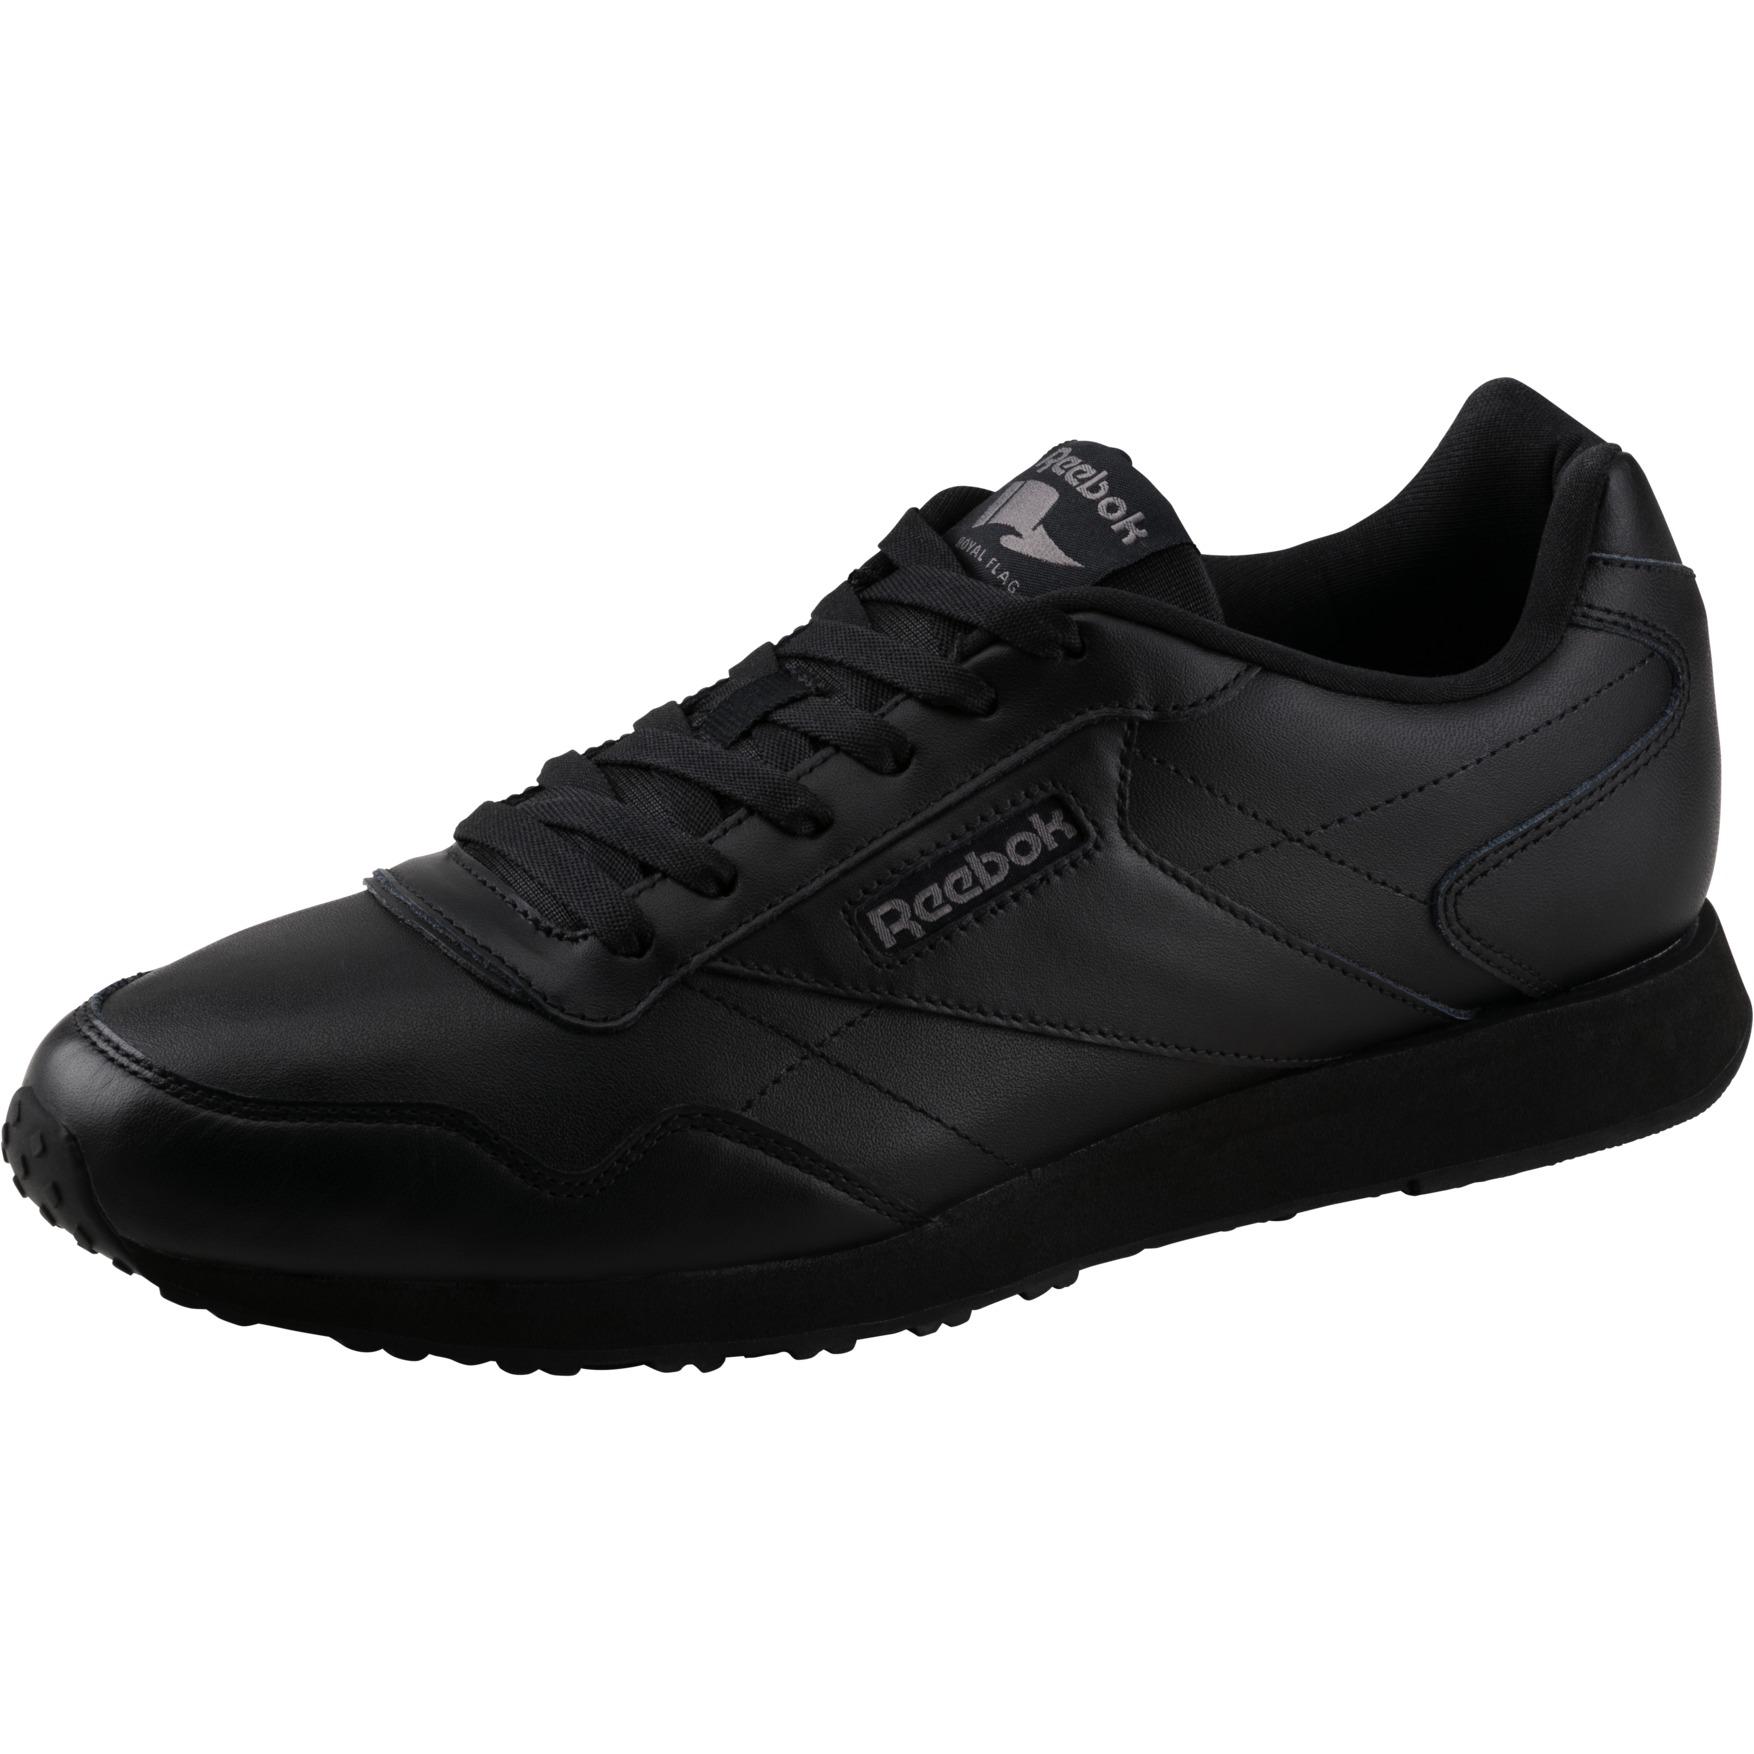 Reebok Royal Glide LX Herren Sneaker Leder Sportschuh Freizeitschuhe schwarz NEU